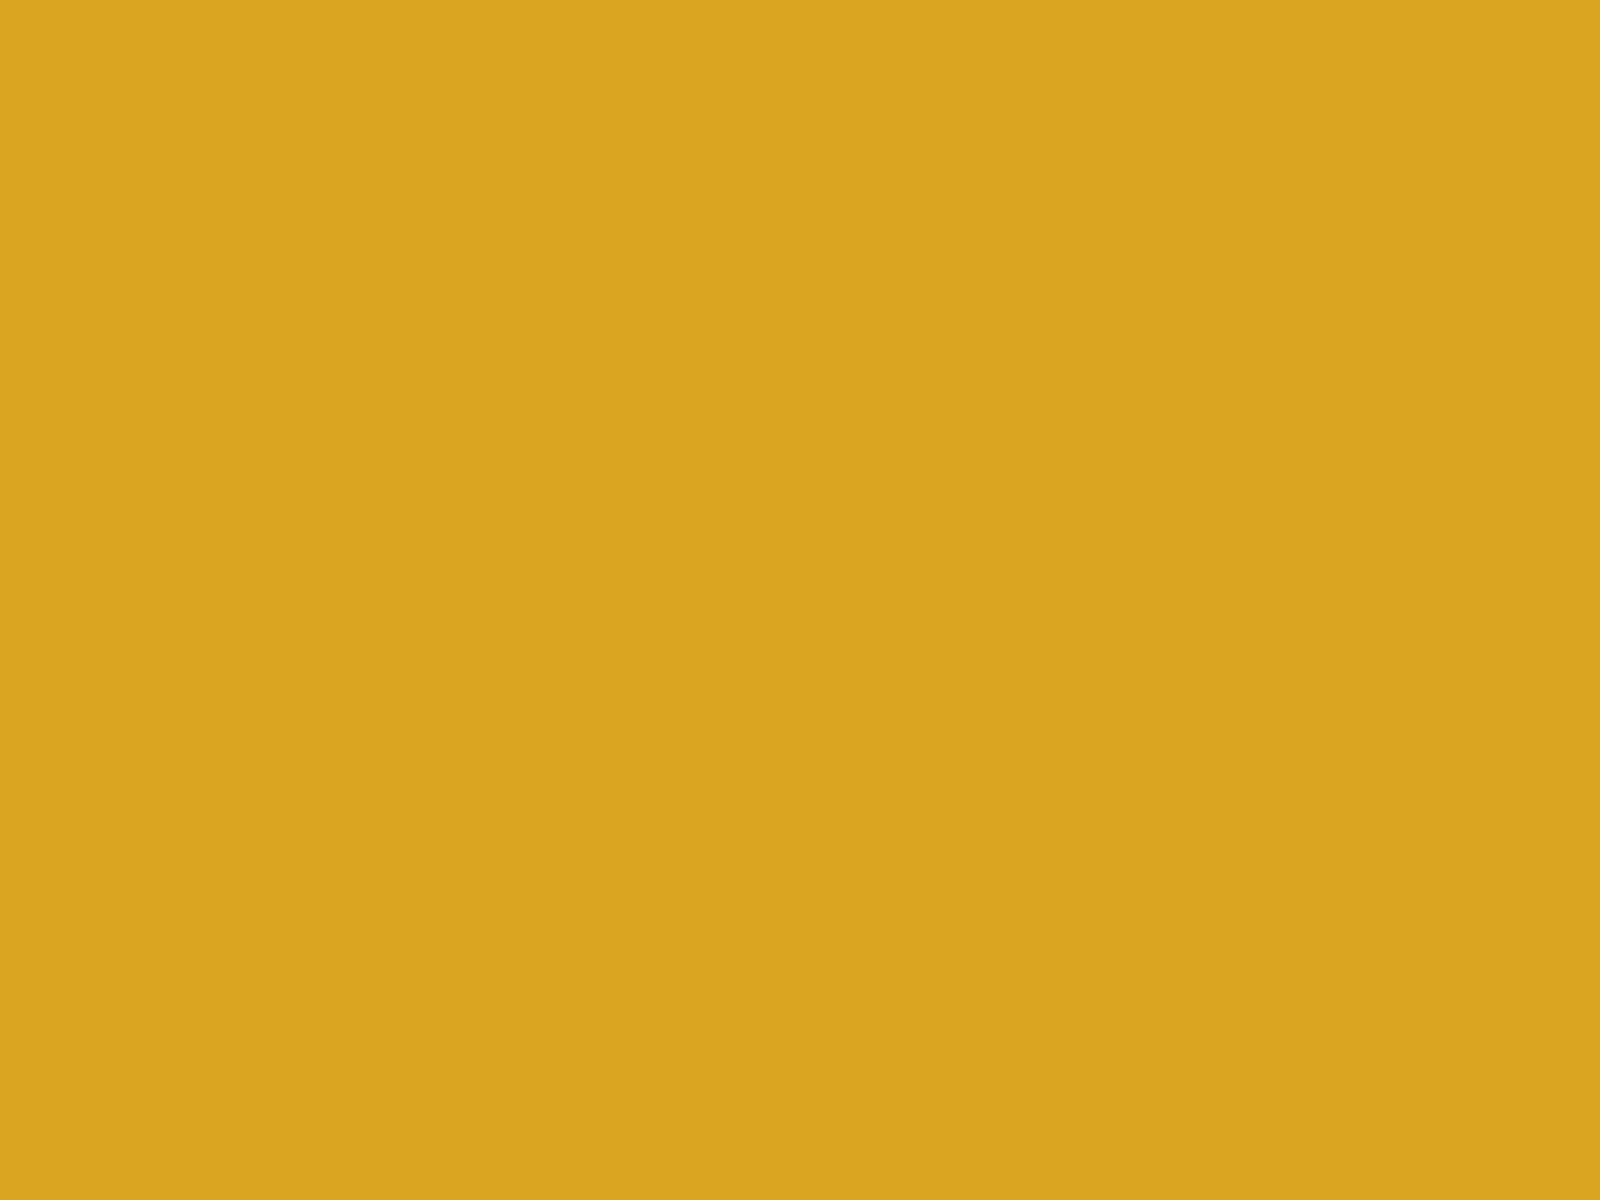 1600x1200 Goldenrod Solid Color Background